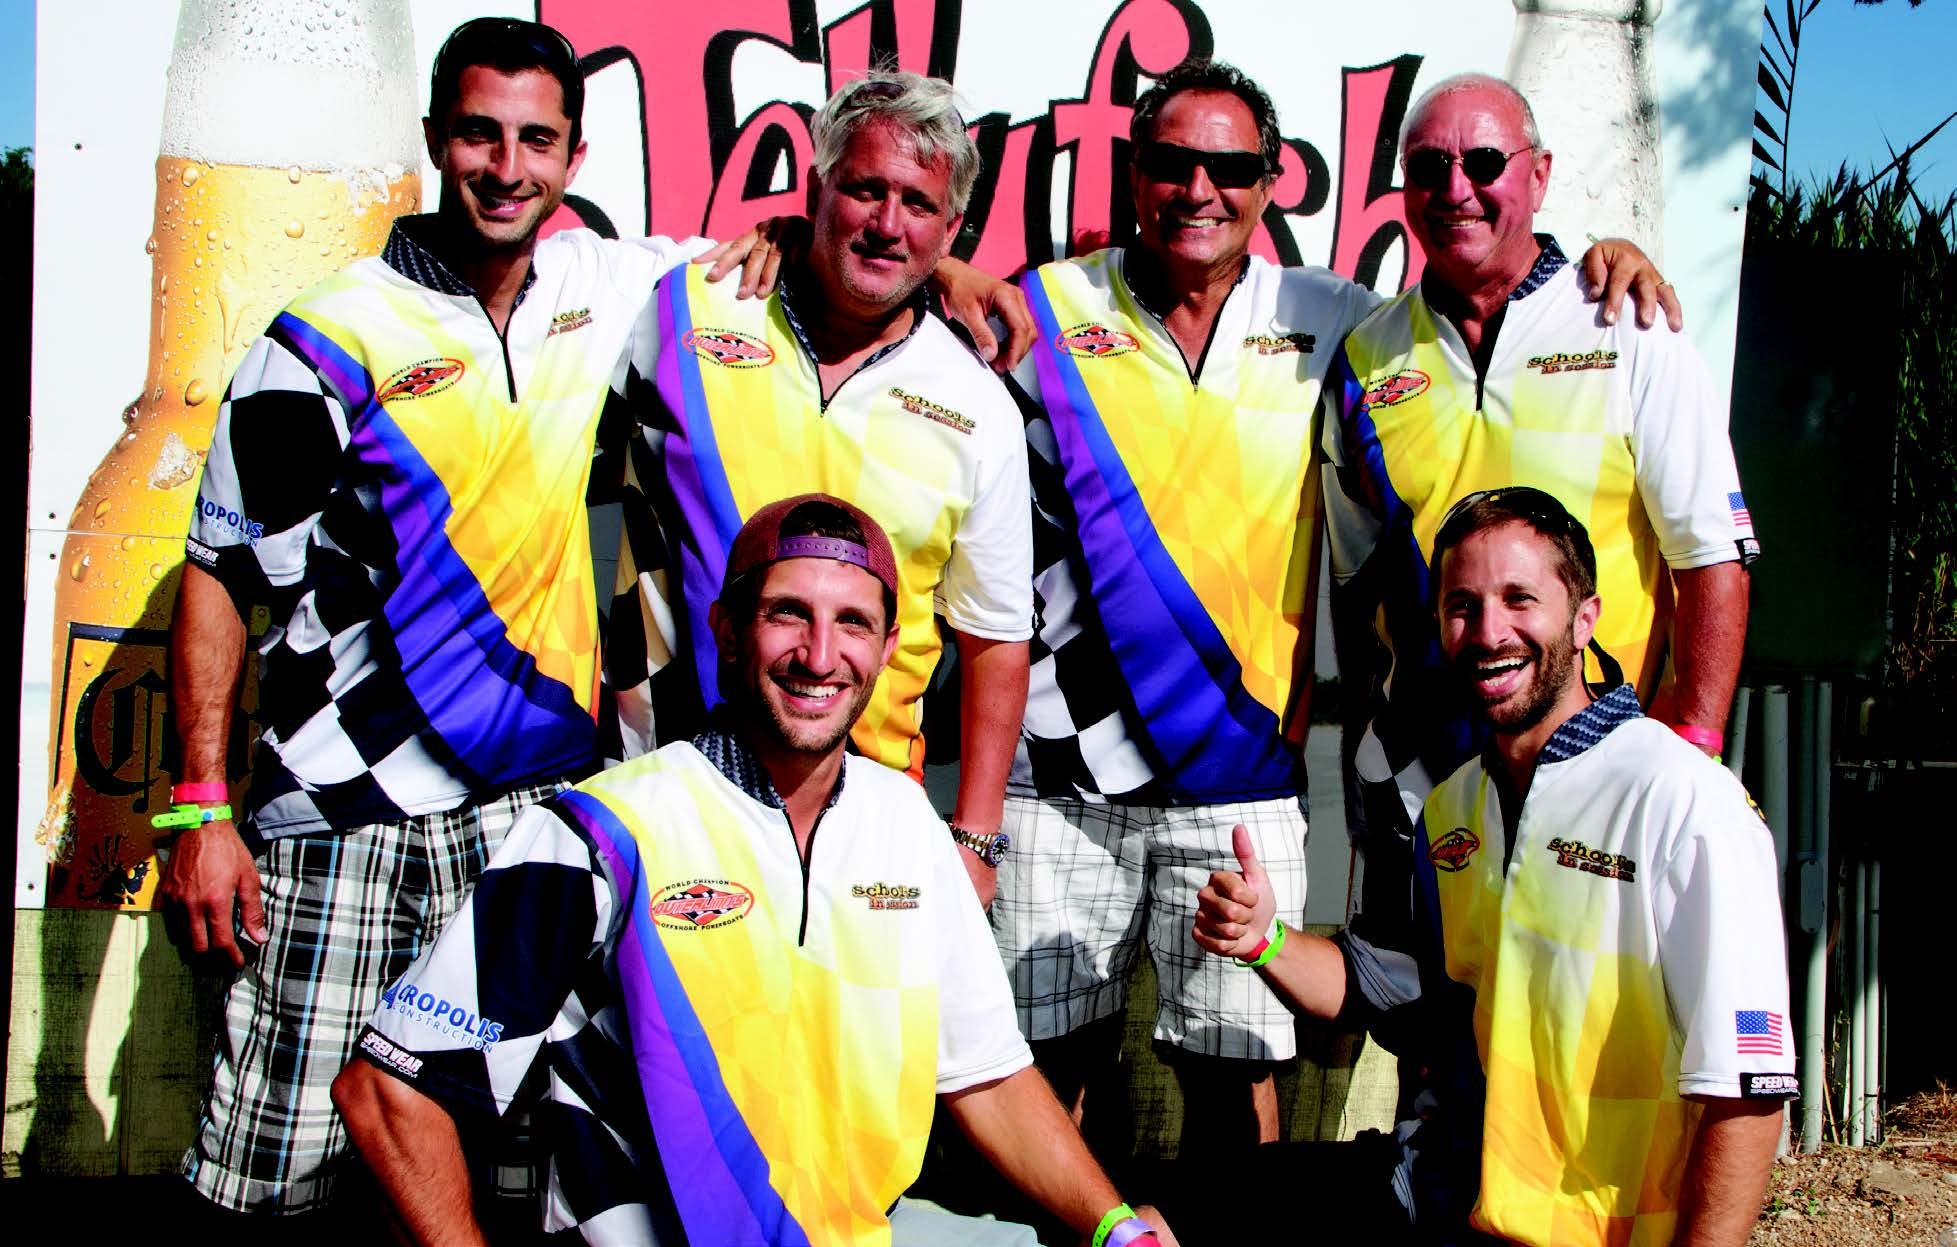 L-R Top Row: Mike Diakoulas, Dave Seibert, John Diakoulas, Dale Lucas. L-R Bottom Row: Brendan Diakoulas, Devin Diakoulas.